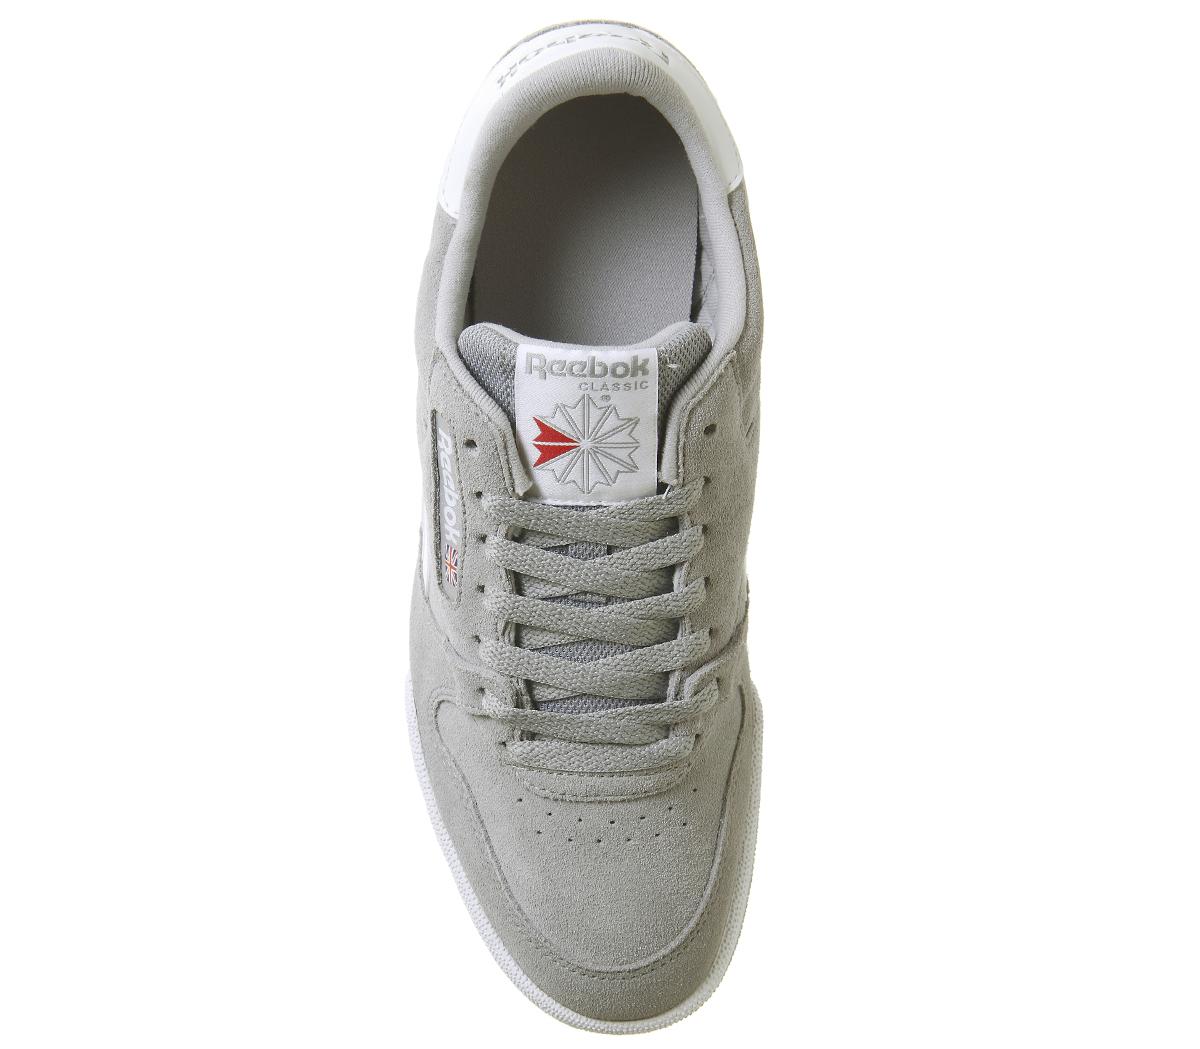 ecf9afae071 Reebok Phase 1 Pro Baskets Étain Gris Blanc Baskets Chaussures